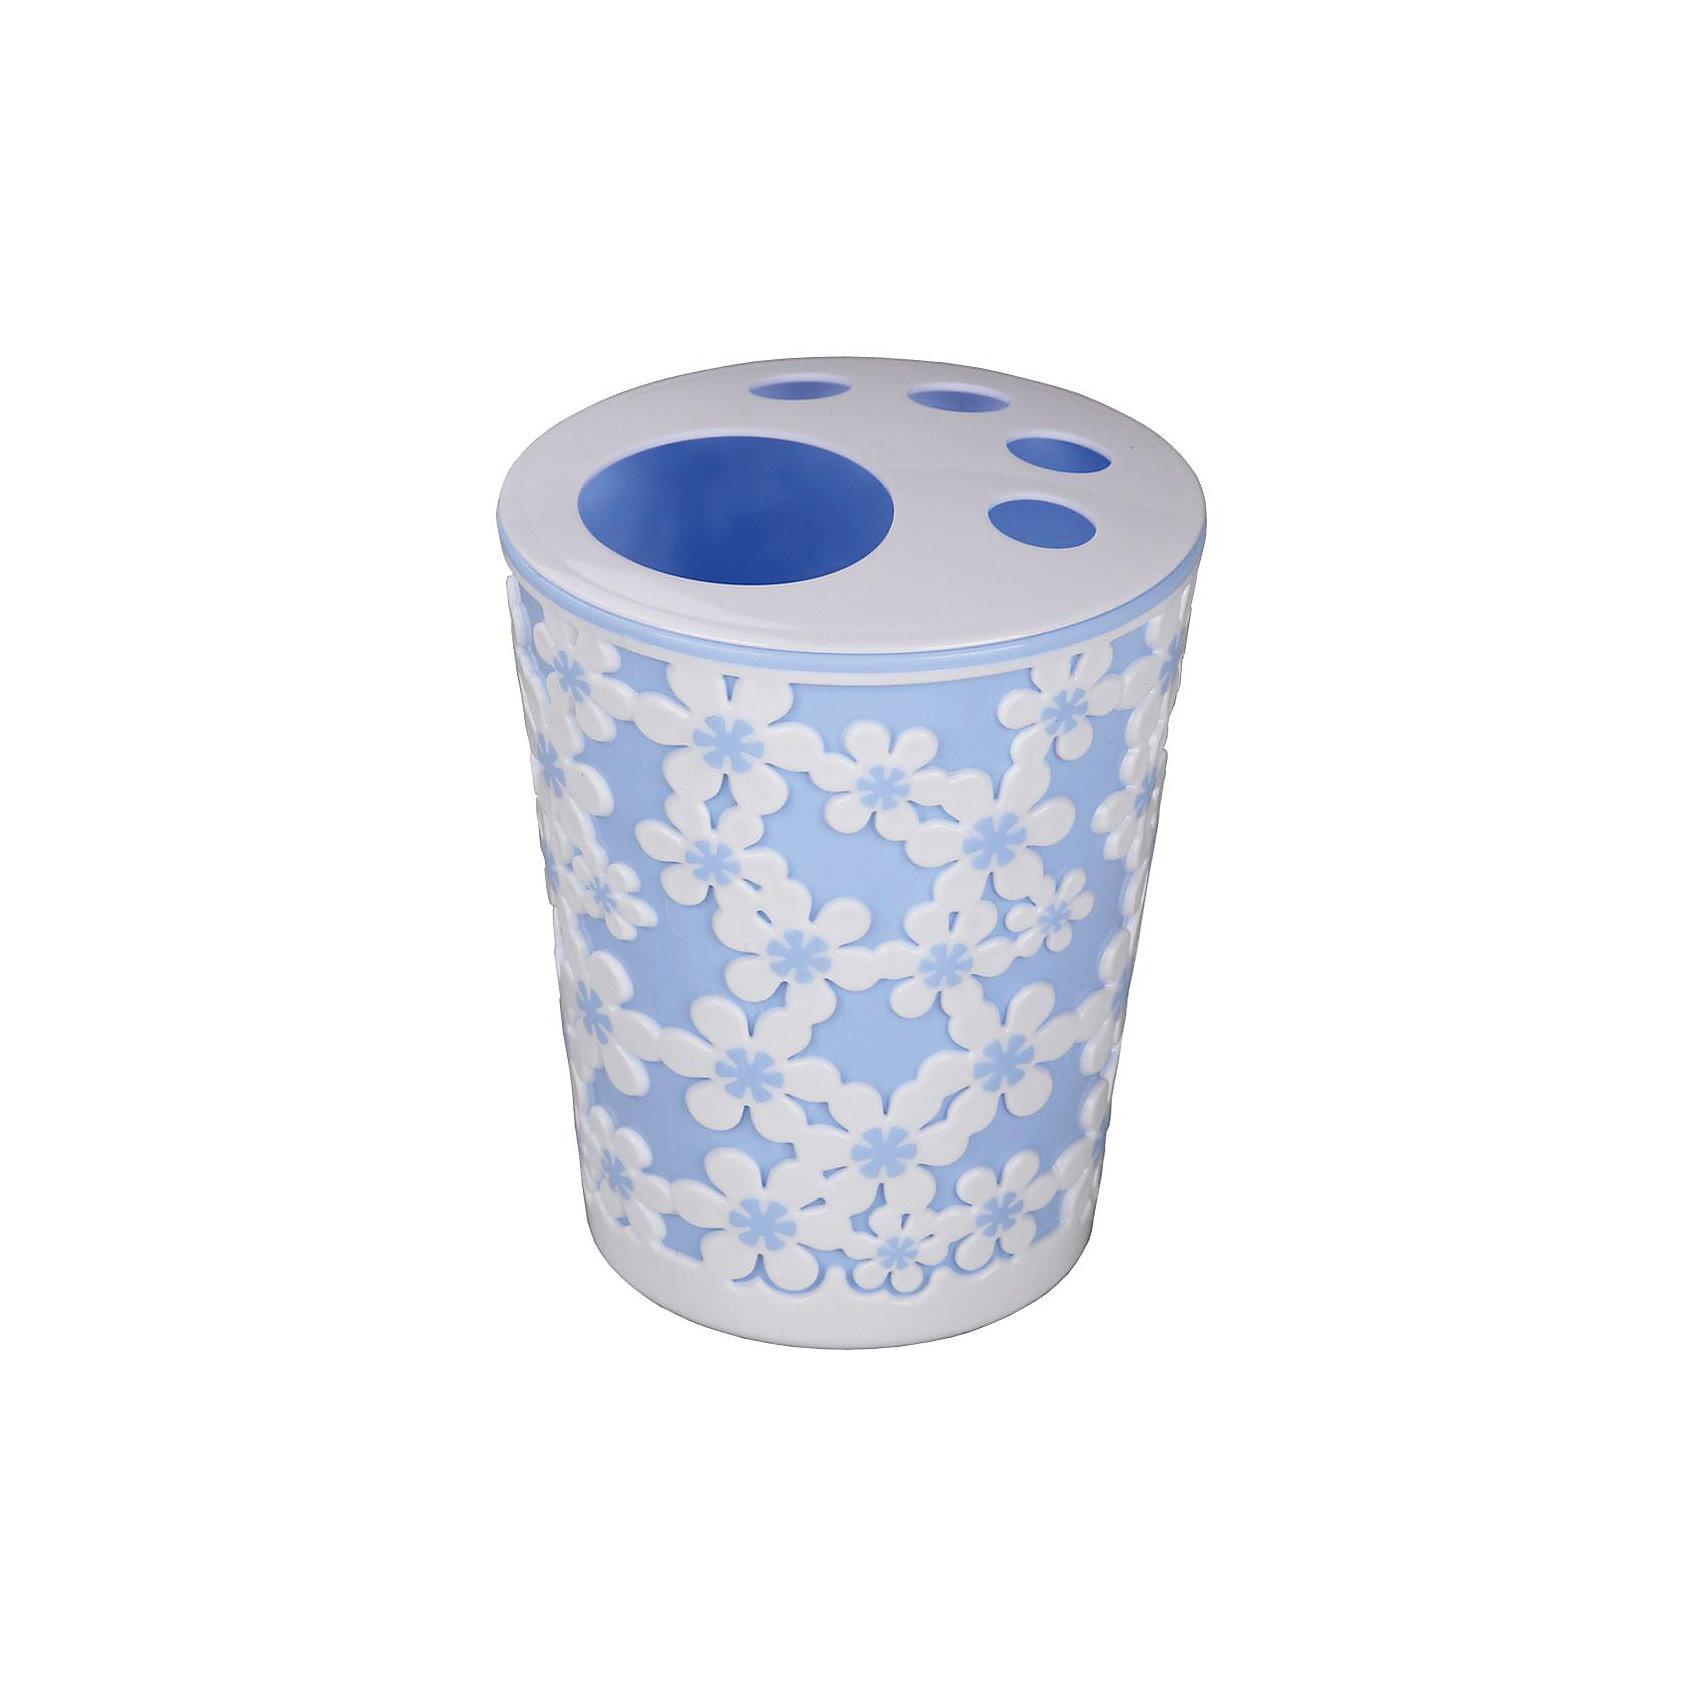 Alternativa Подставка Дольче Витадля зубных щеток, Alternativa, голубой-белый alternativa ванночка карапуз alternativa голубой